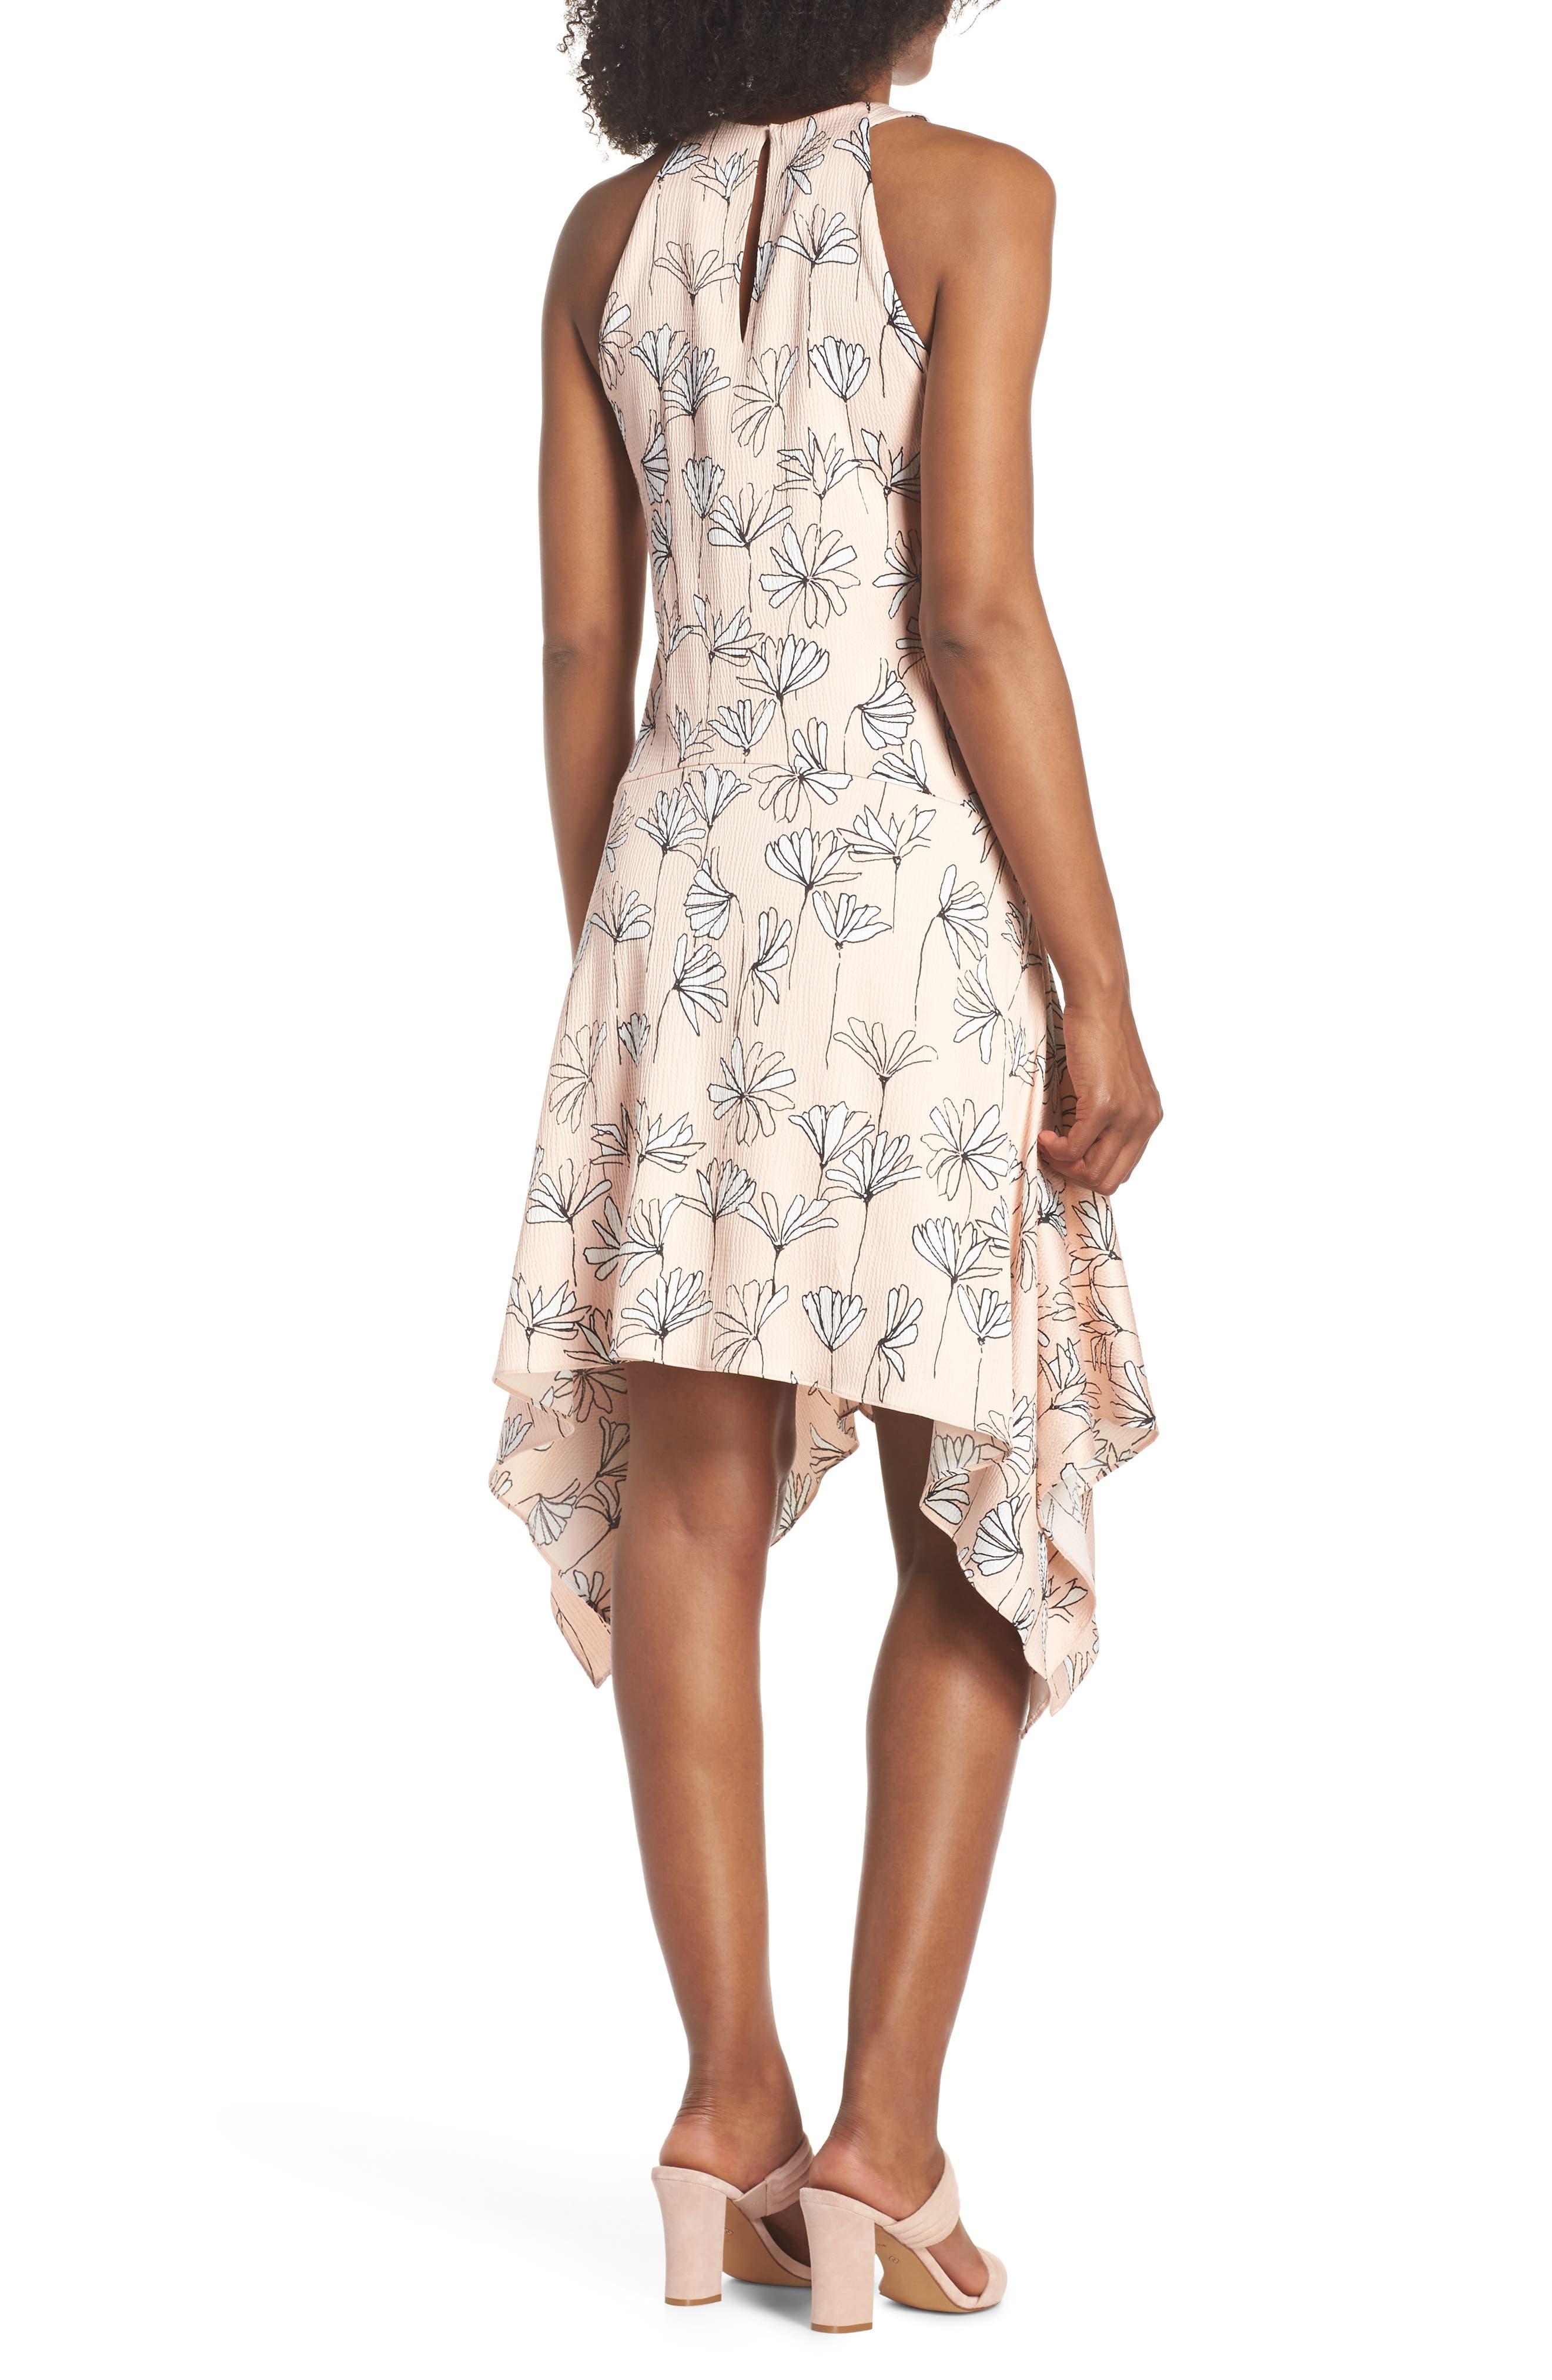 MAGGY LONDON,                             Printed Handkerchief Hem Dress,                             Alternate thumbnail 2, color,                             690